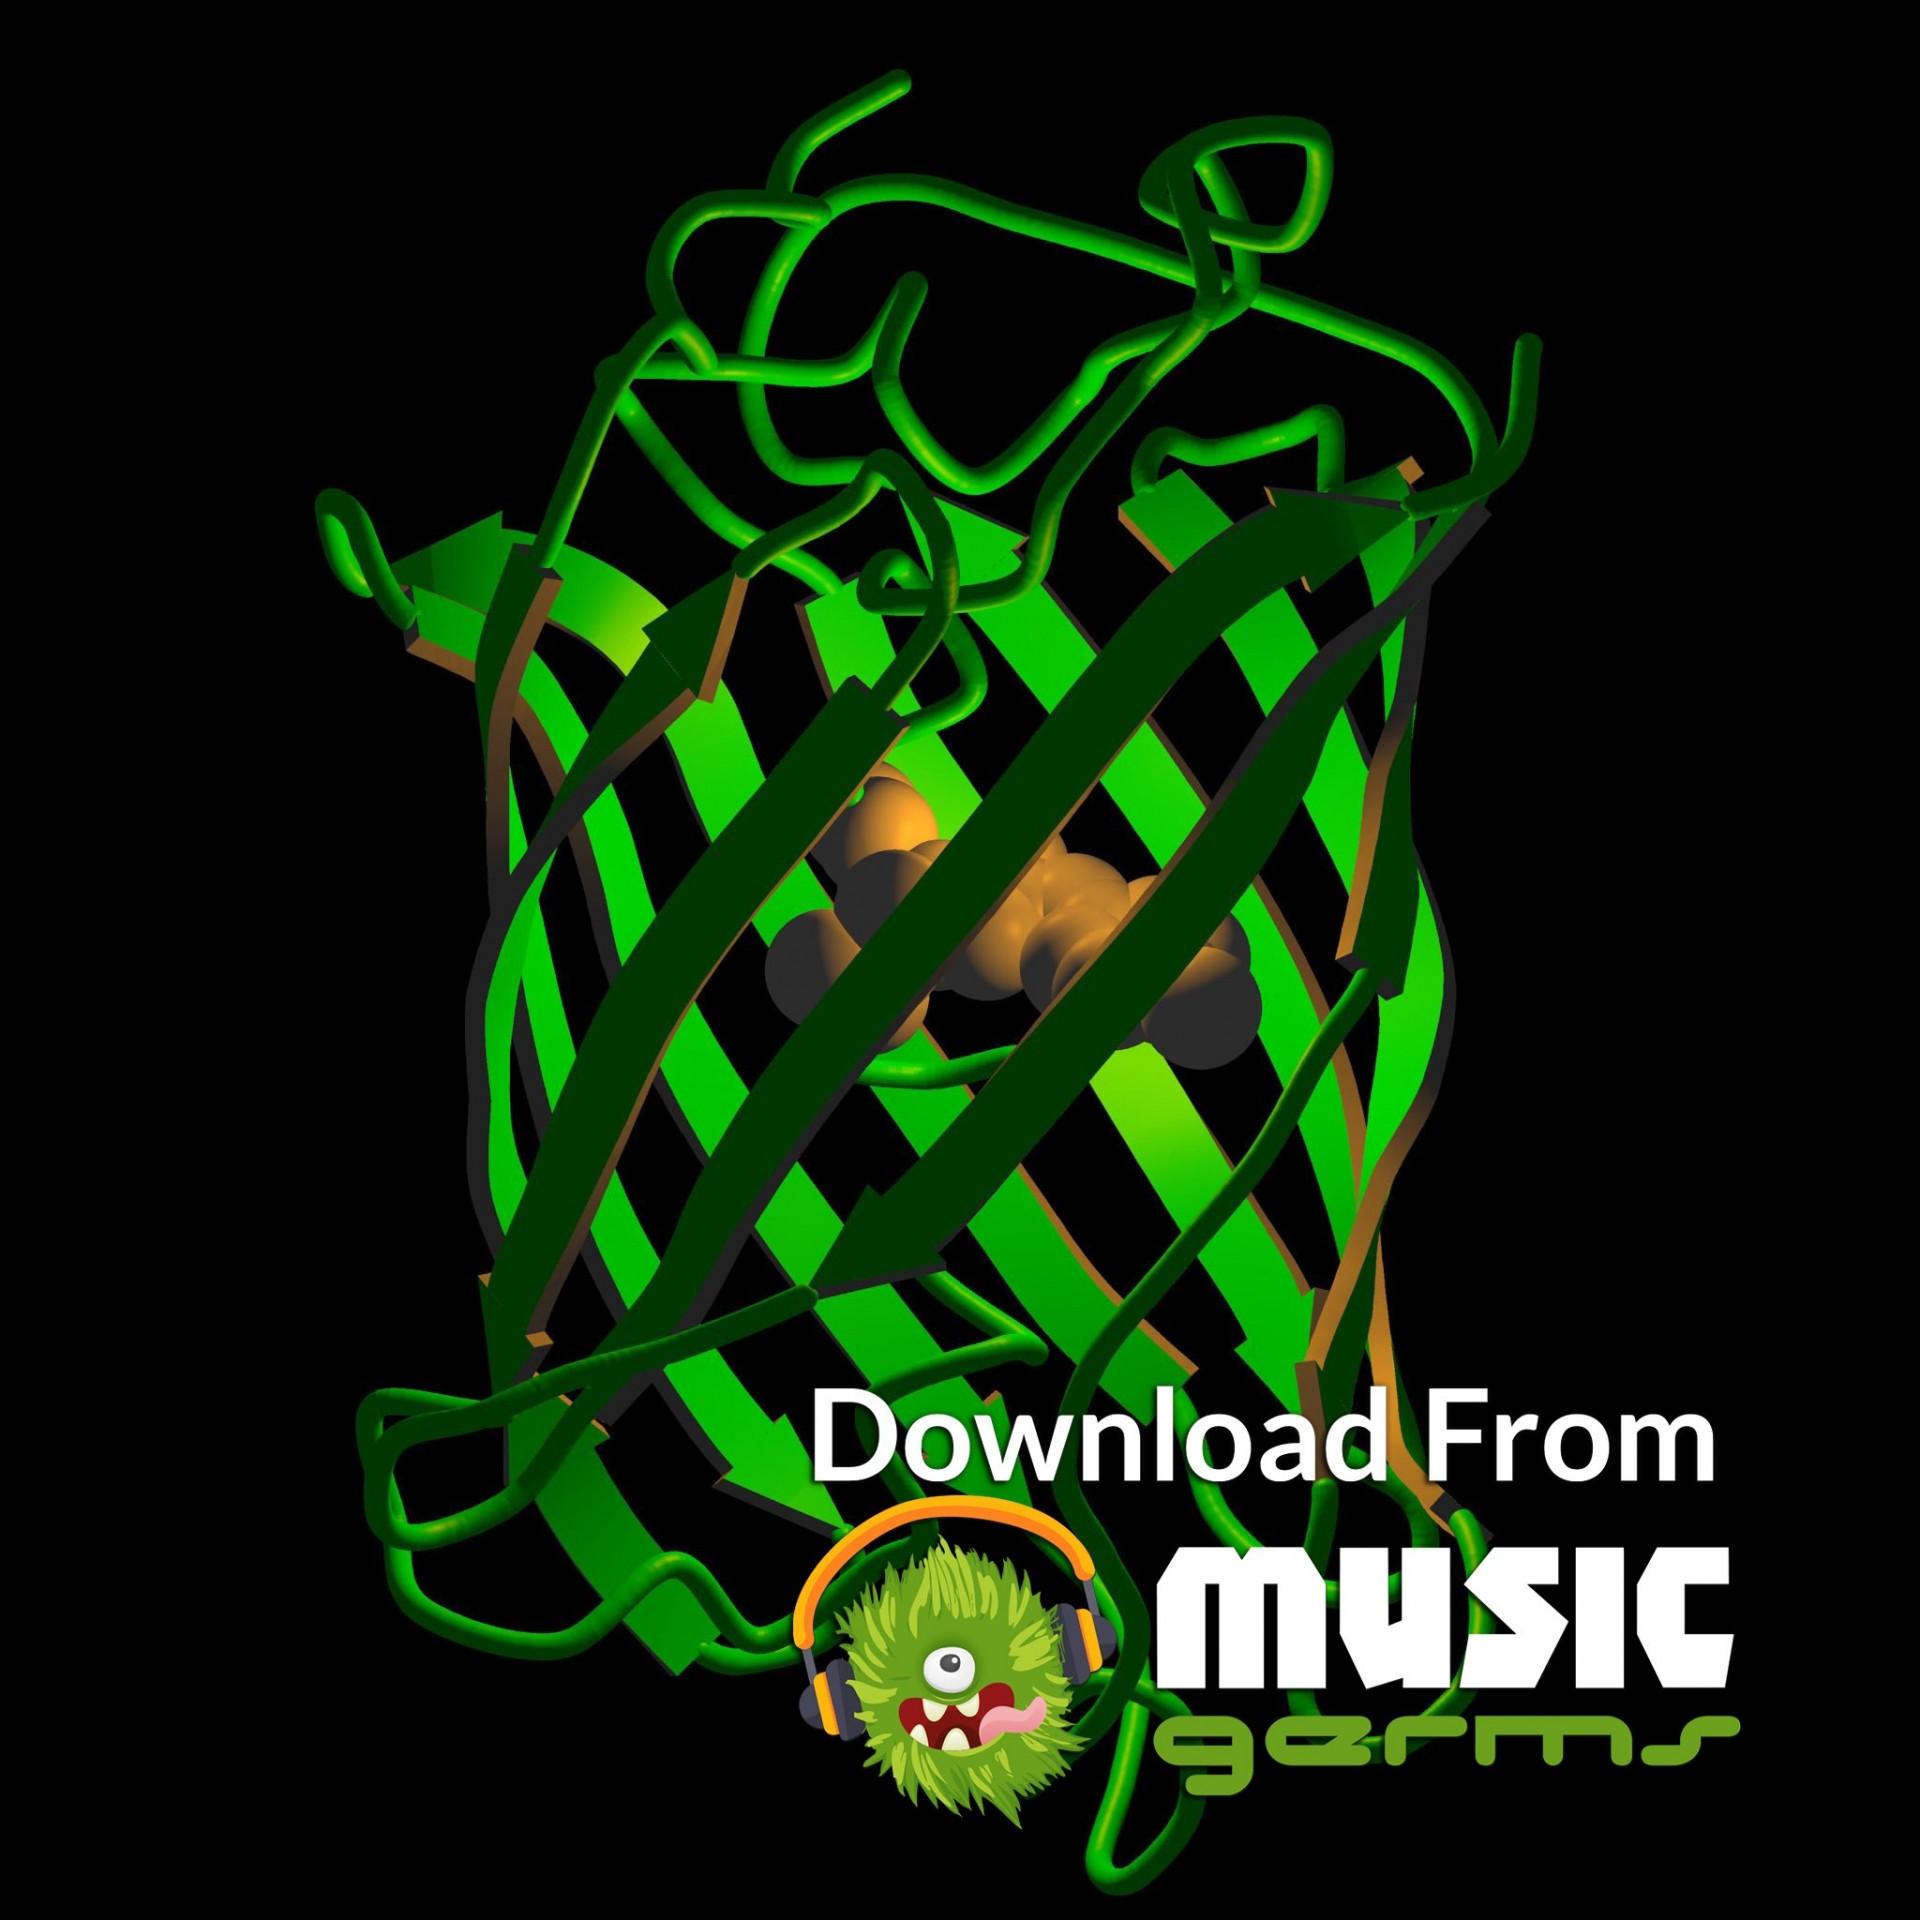 018 Essay On Road Accident Wikipedia Mere Rashke Qamar Arijit Singh Listen Download Mp3 Audio Song Imposing 1920